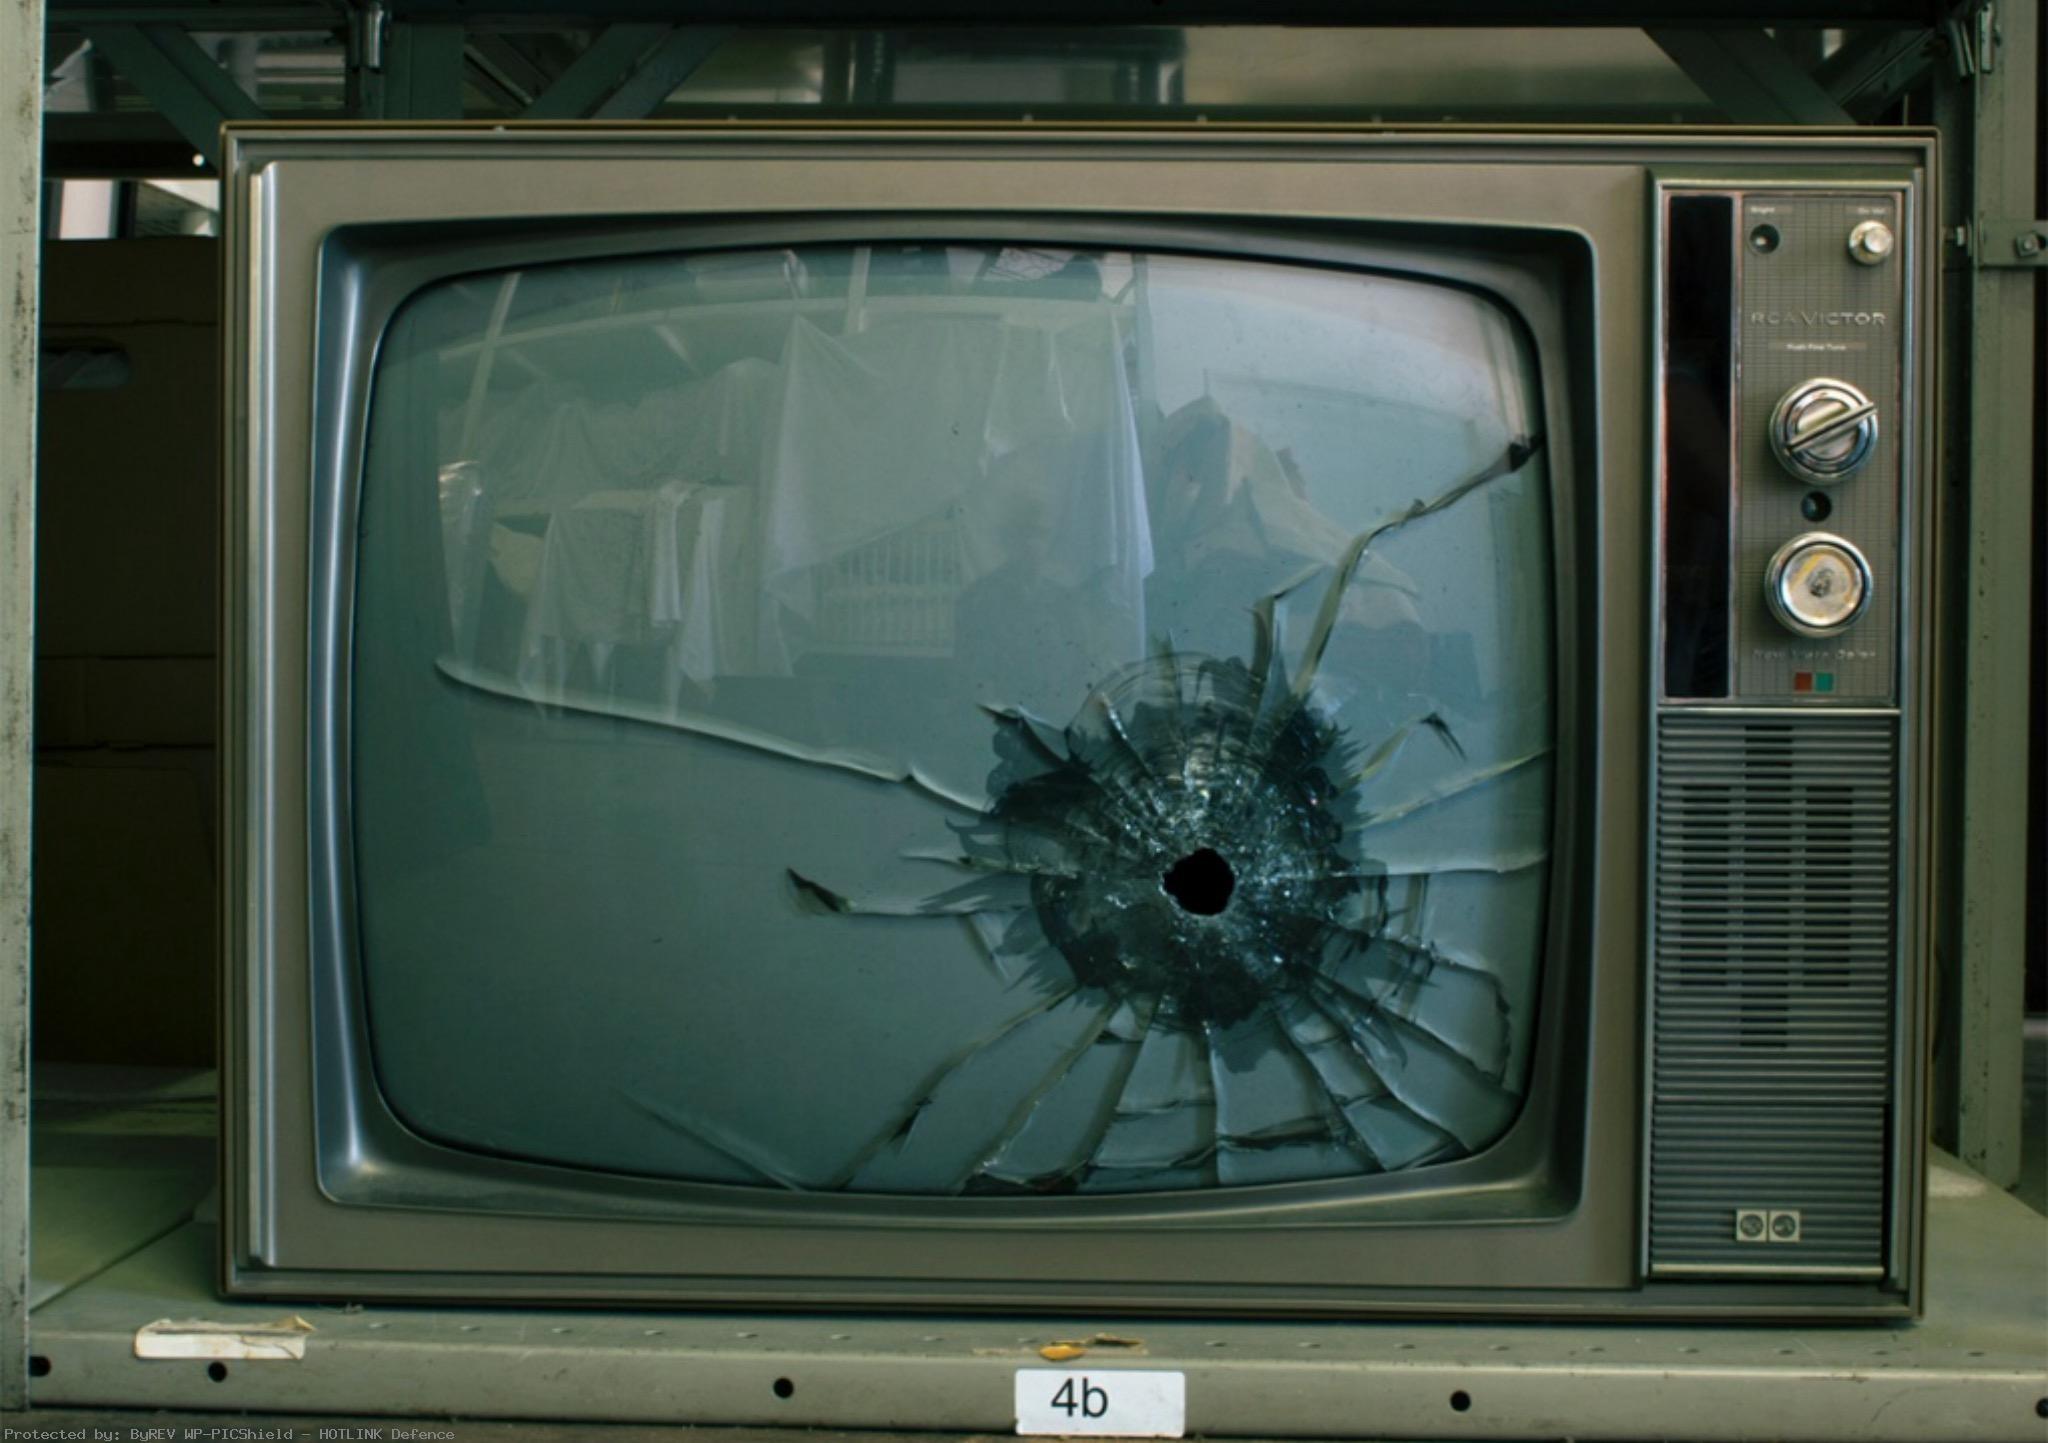 Broken-TV-grunge-wallpaper-wp4002855